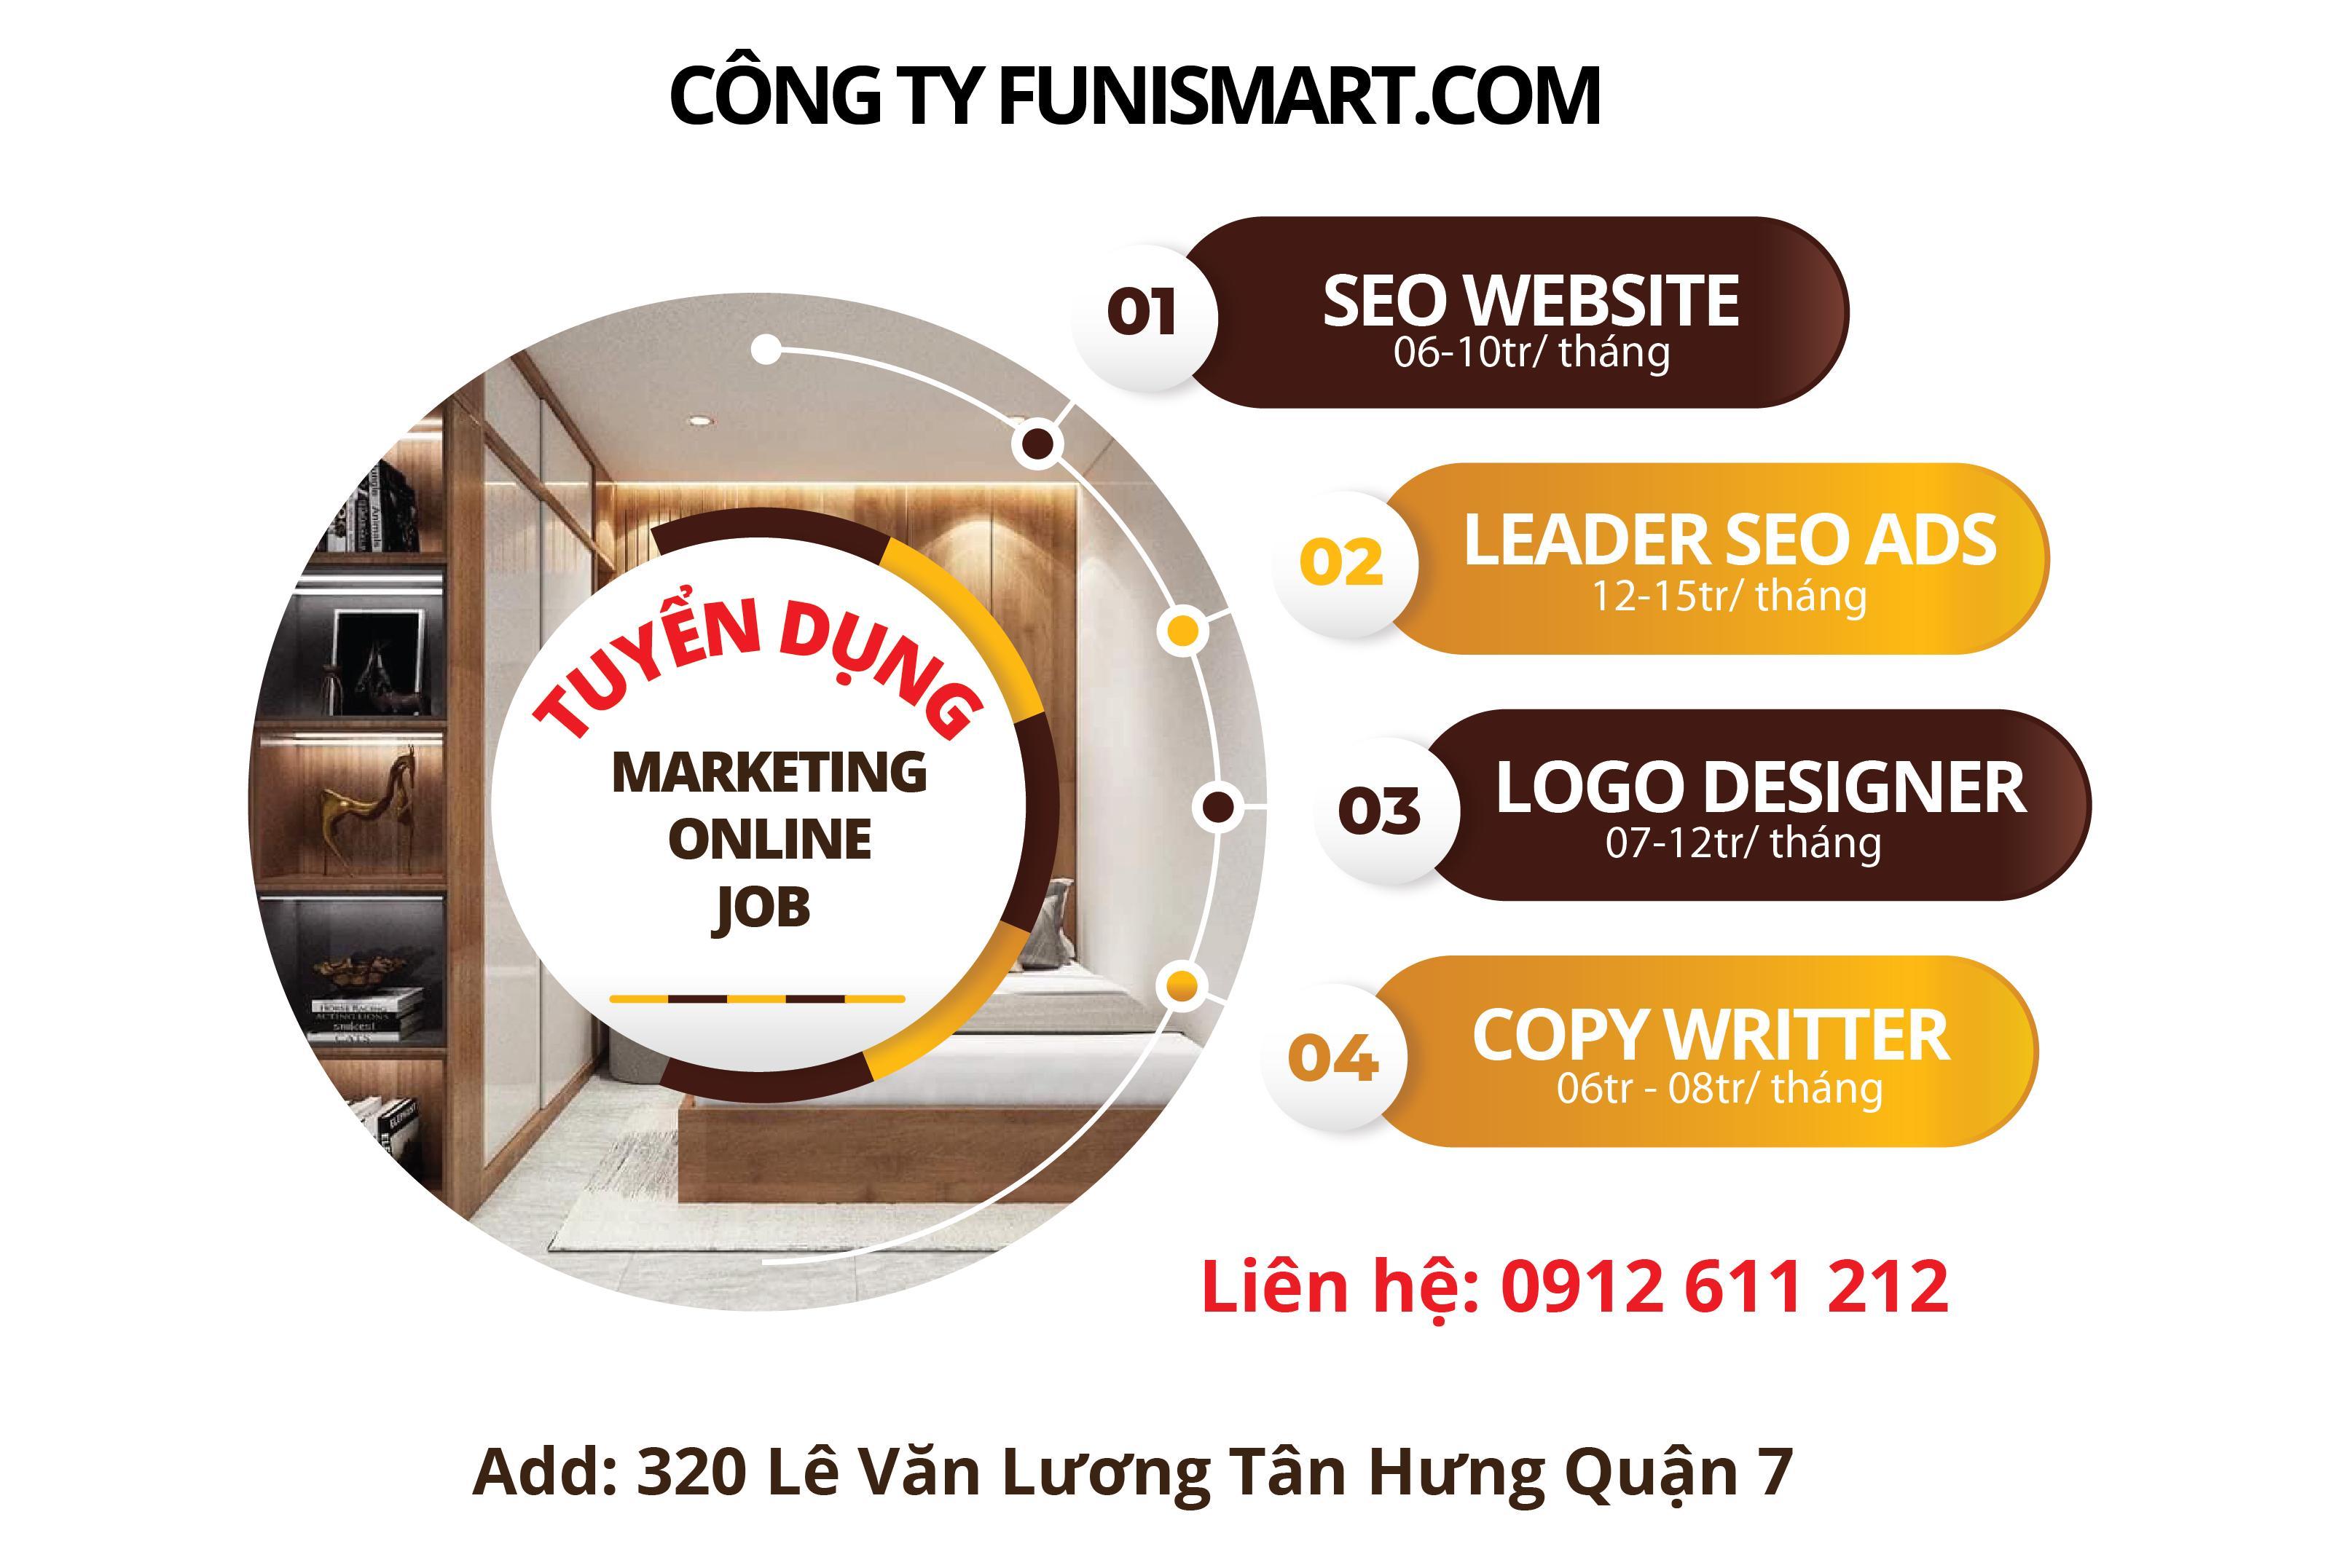 Work with Funismart tuyển dụng nhân sự